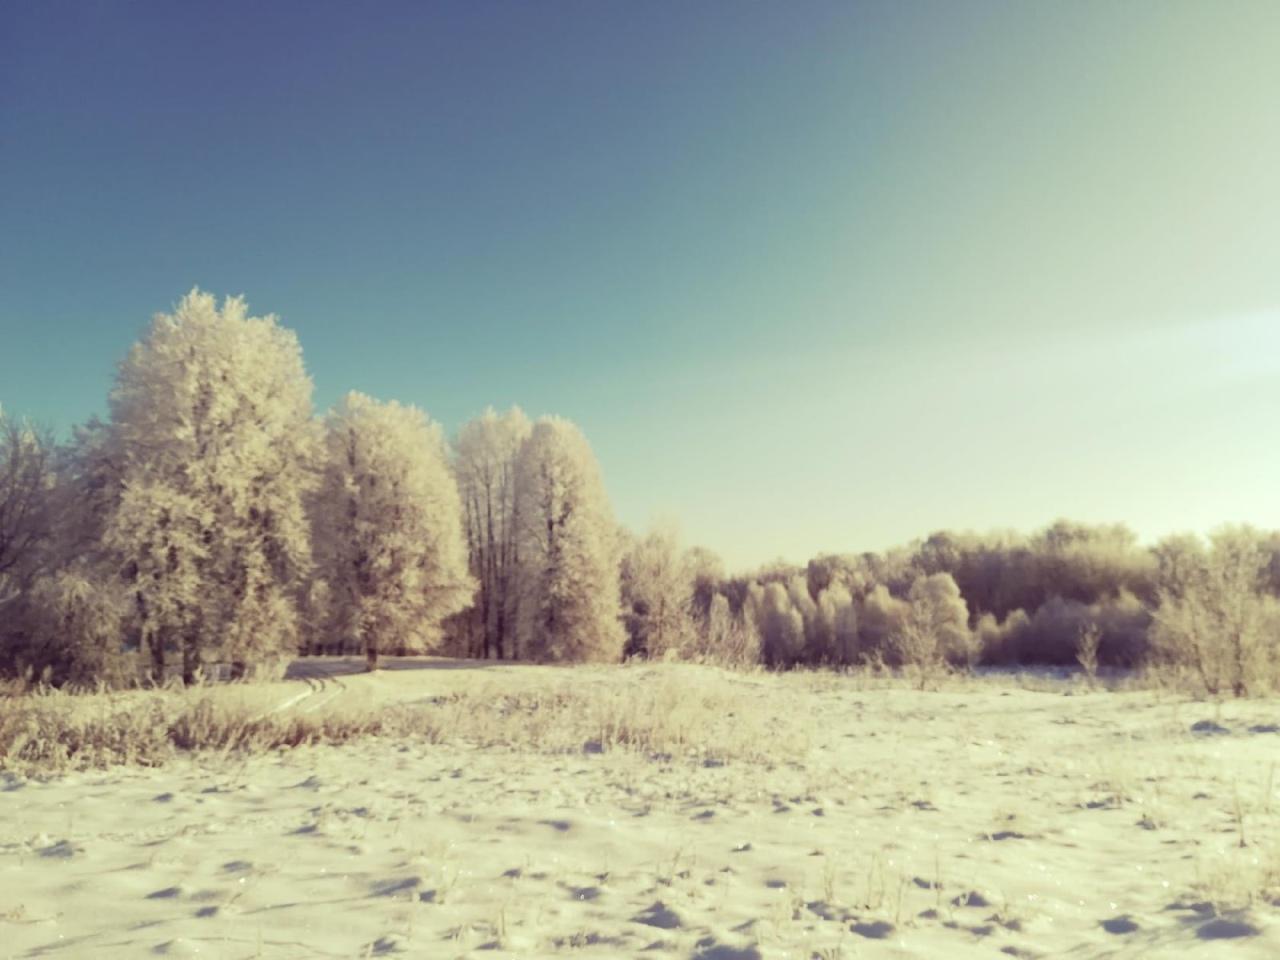 Ночью в Курской области синоптики прогнозируют до 27ºС мороза, а днем -7ºС